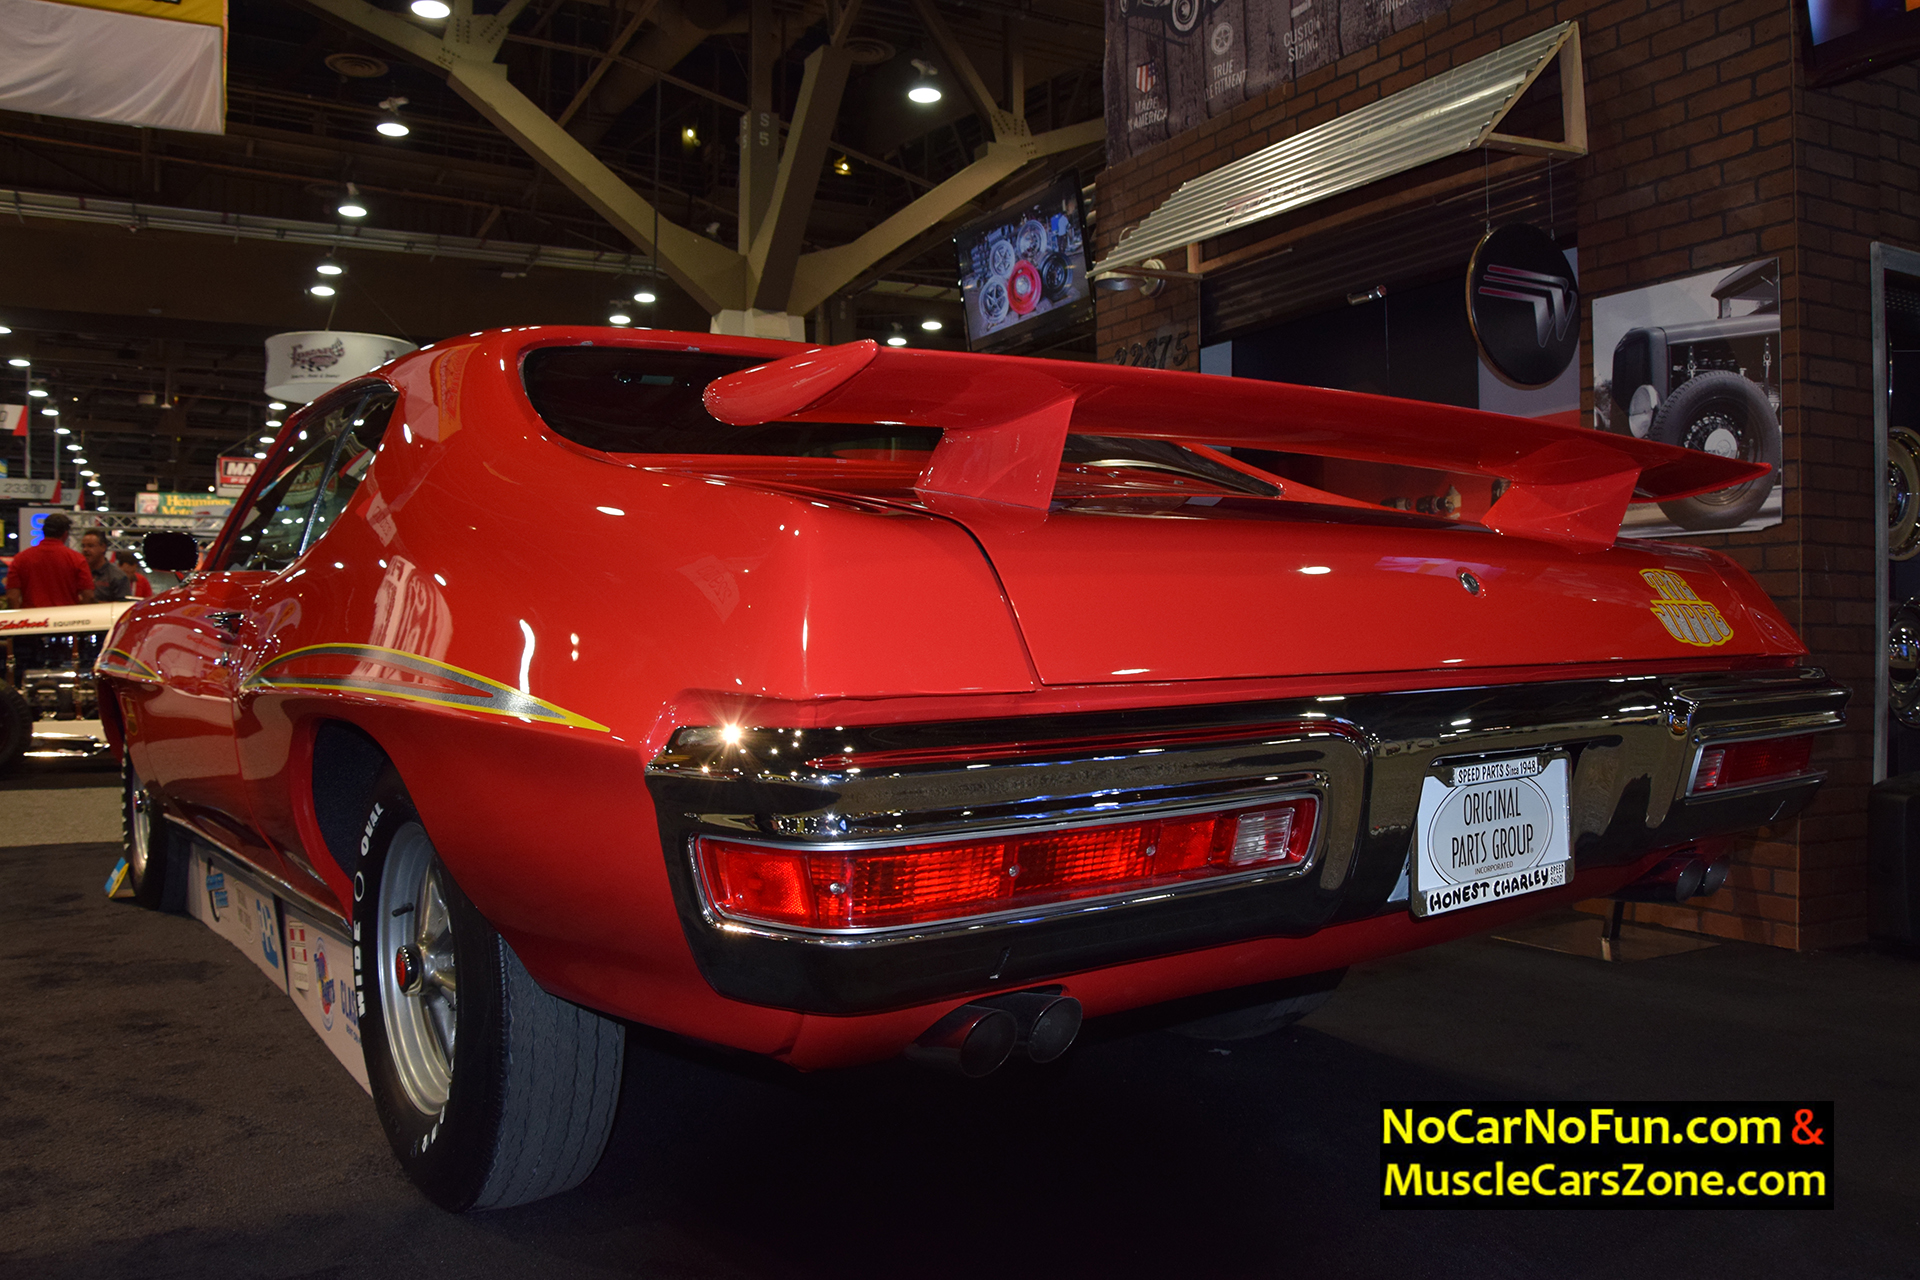 gto 1970 judge pontiac motor sema restored stroud bodie cars muscle